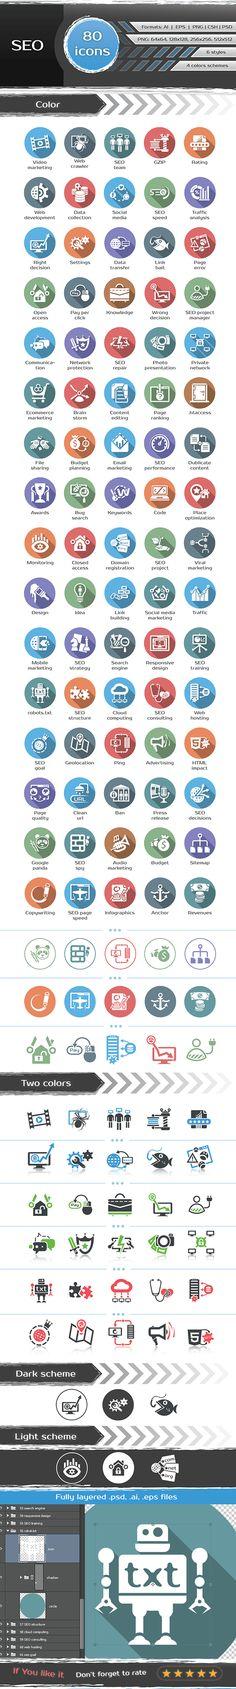 SEO icons on Behance